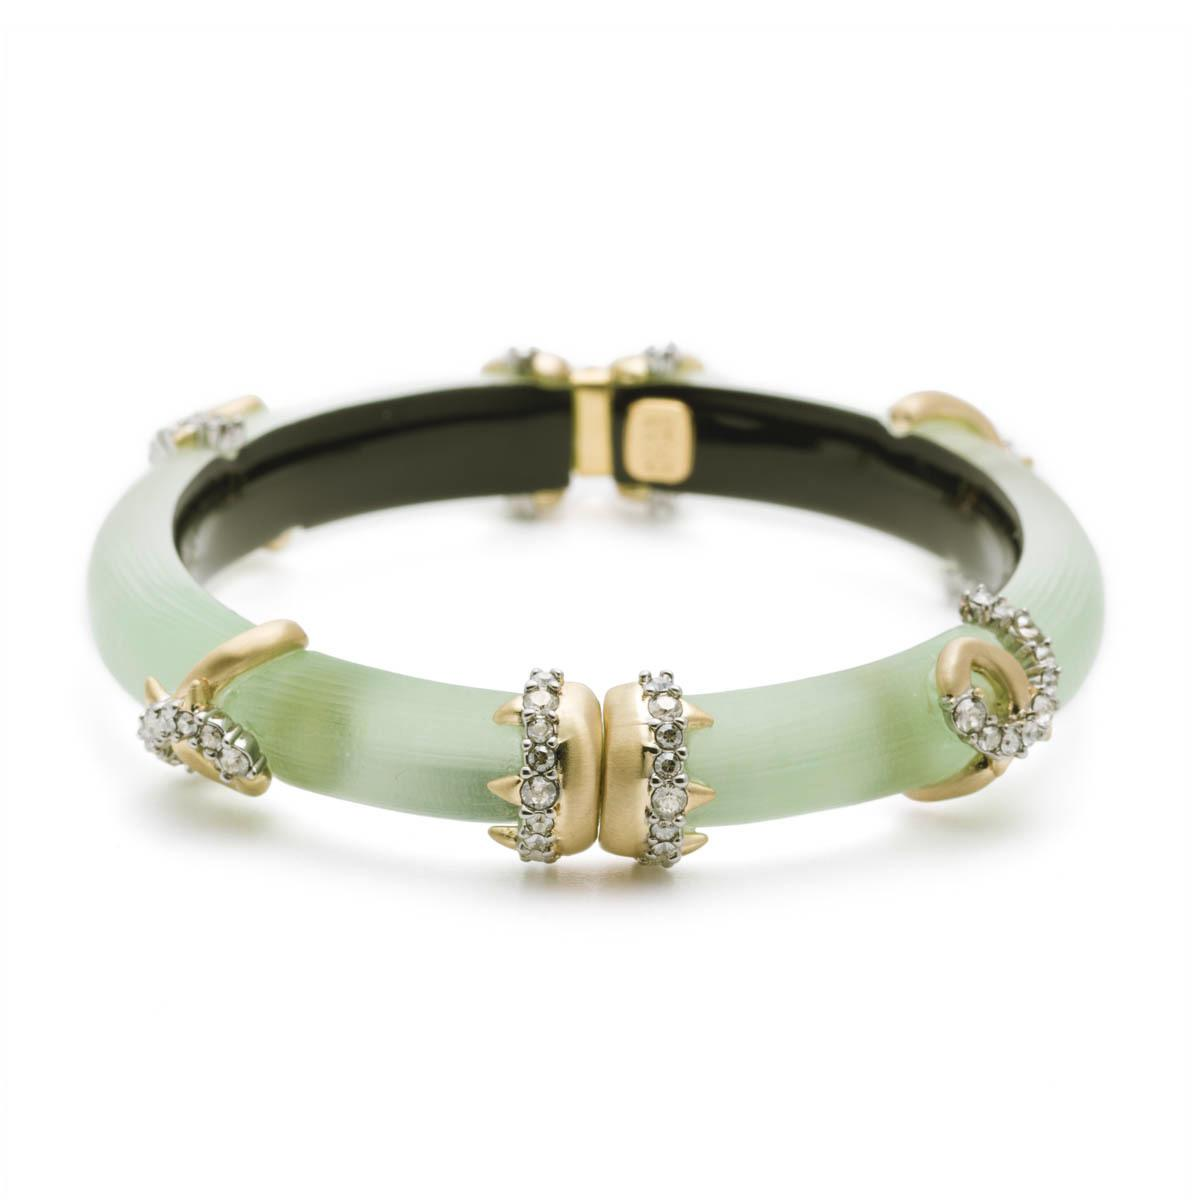 Alexis Bittar Folded Knot Hinge Bracelet Rm6rsi